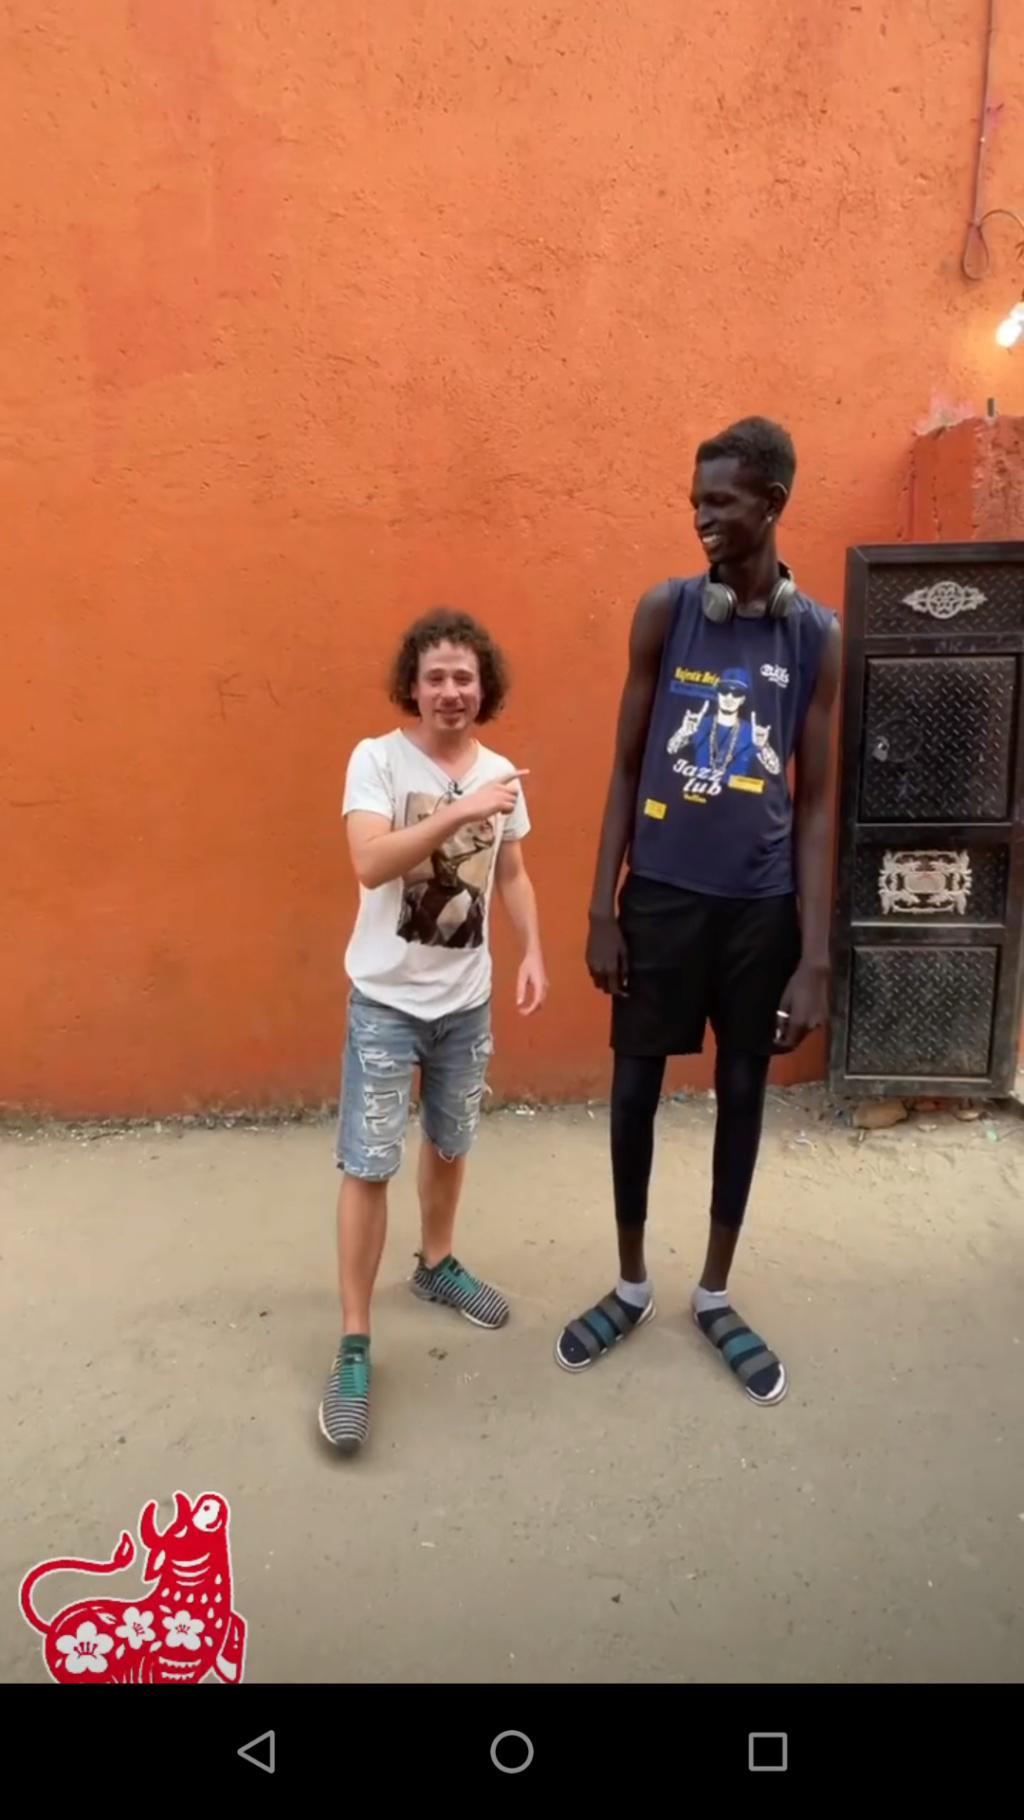 ¿Cuánto mide Luisito Comunica? - Altura - Real height - Página 14 Screen26